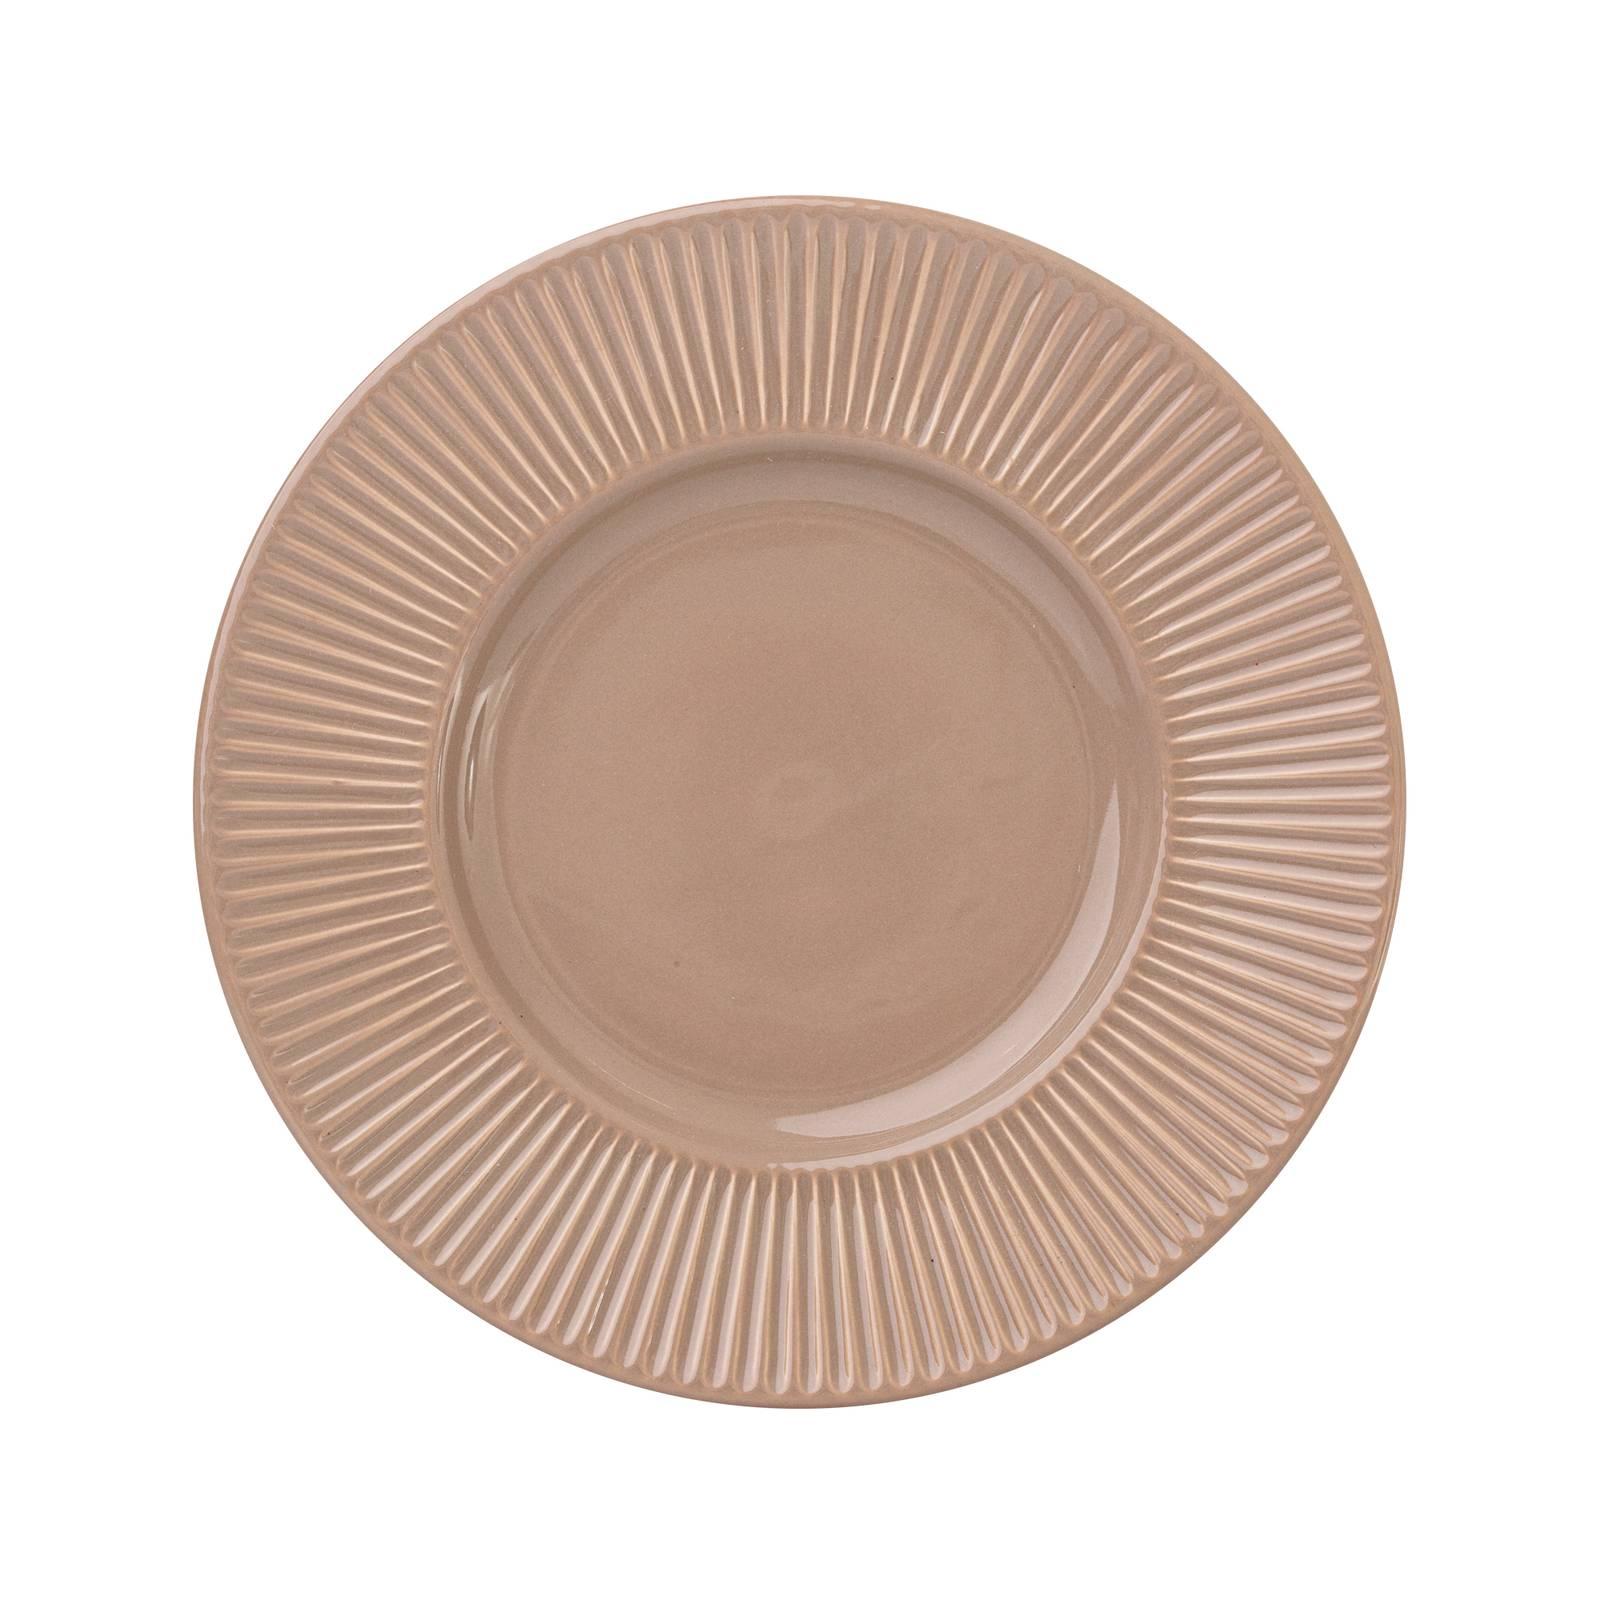 Dessert plate Palette 22.5 cm AMBITION Sensual brown